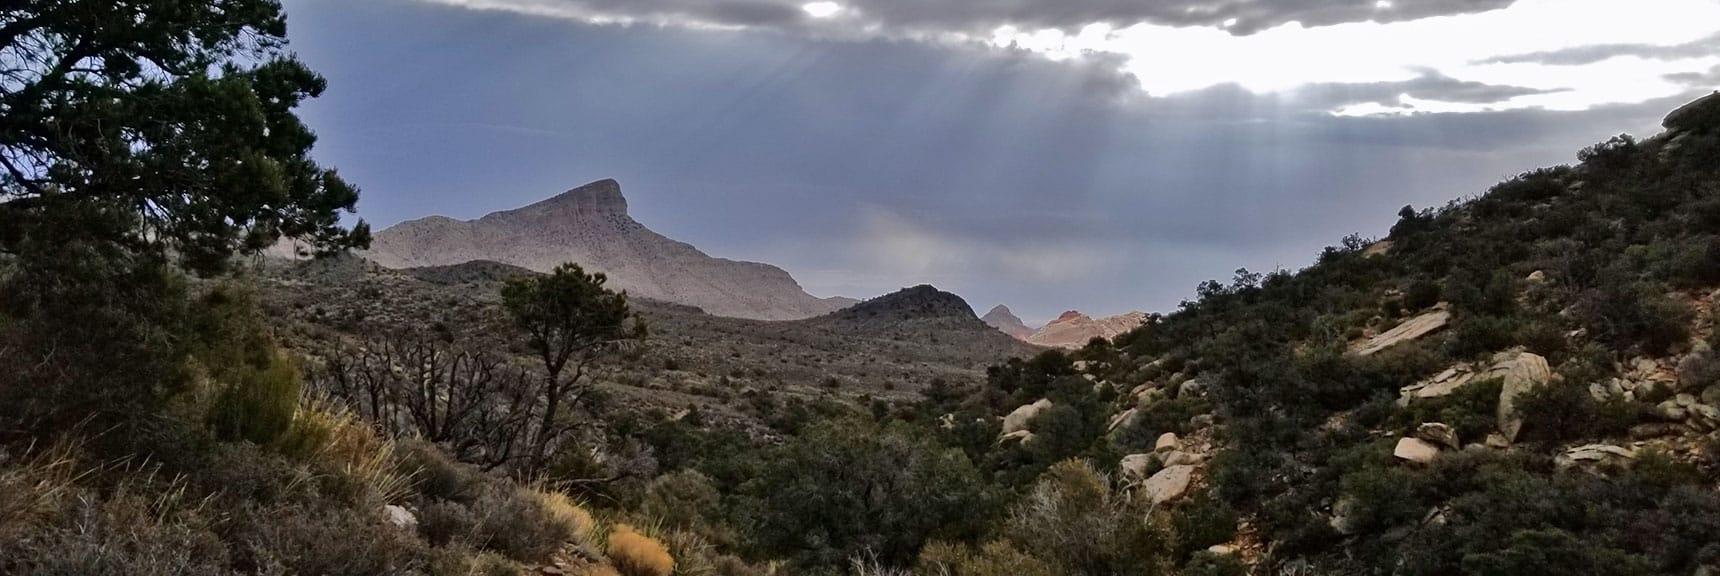 Looking Back at Turtlehead Peak From White Rock Mountain Loop in Red Rock Park, Nevada